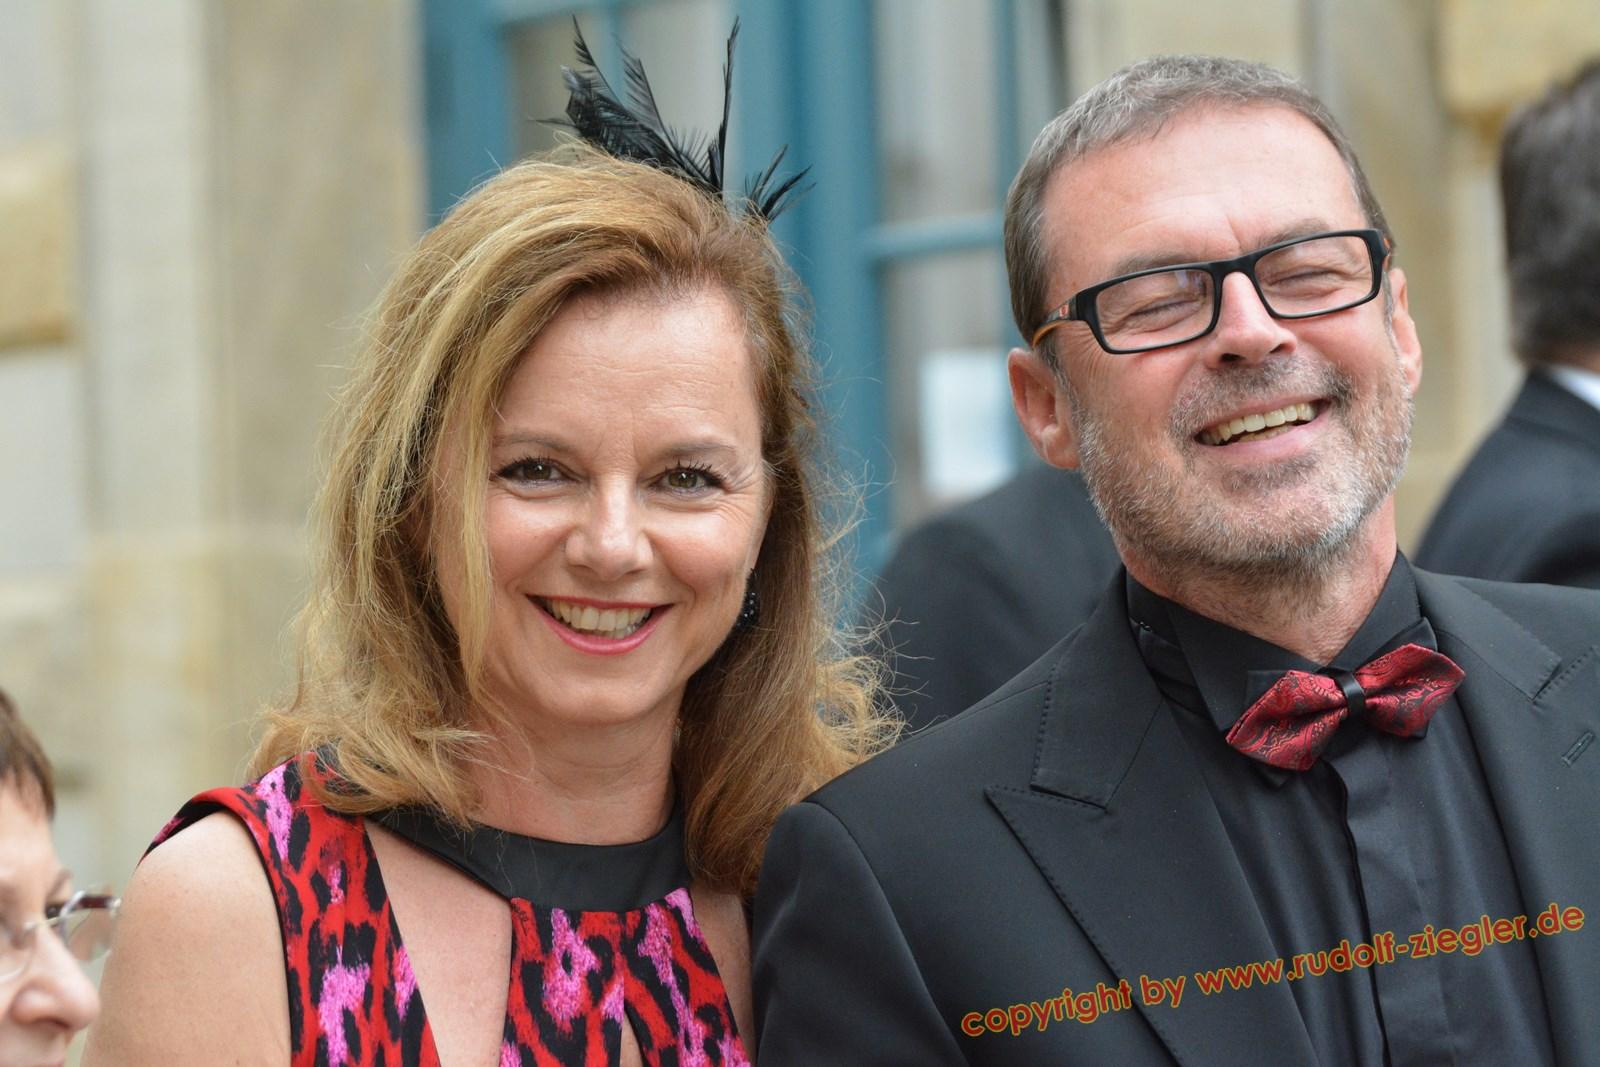 Festspiele Bayreuth - Premiere 139-A (1600x1200)